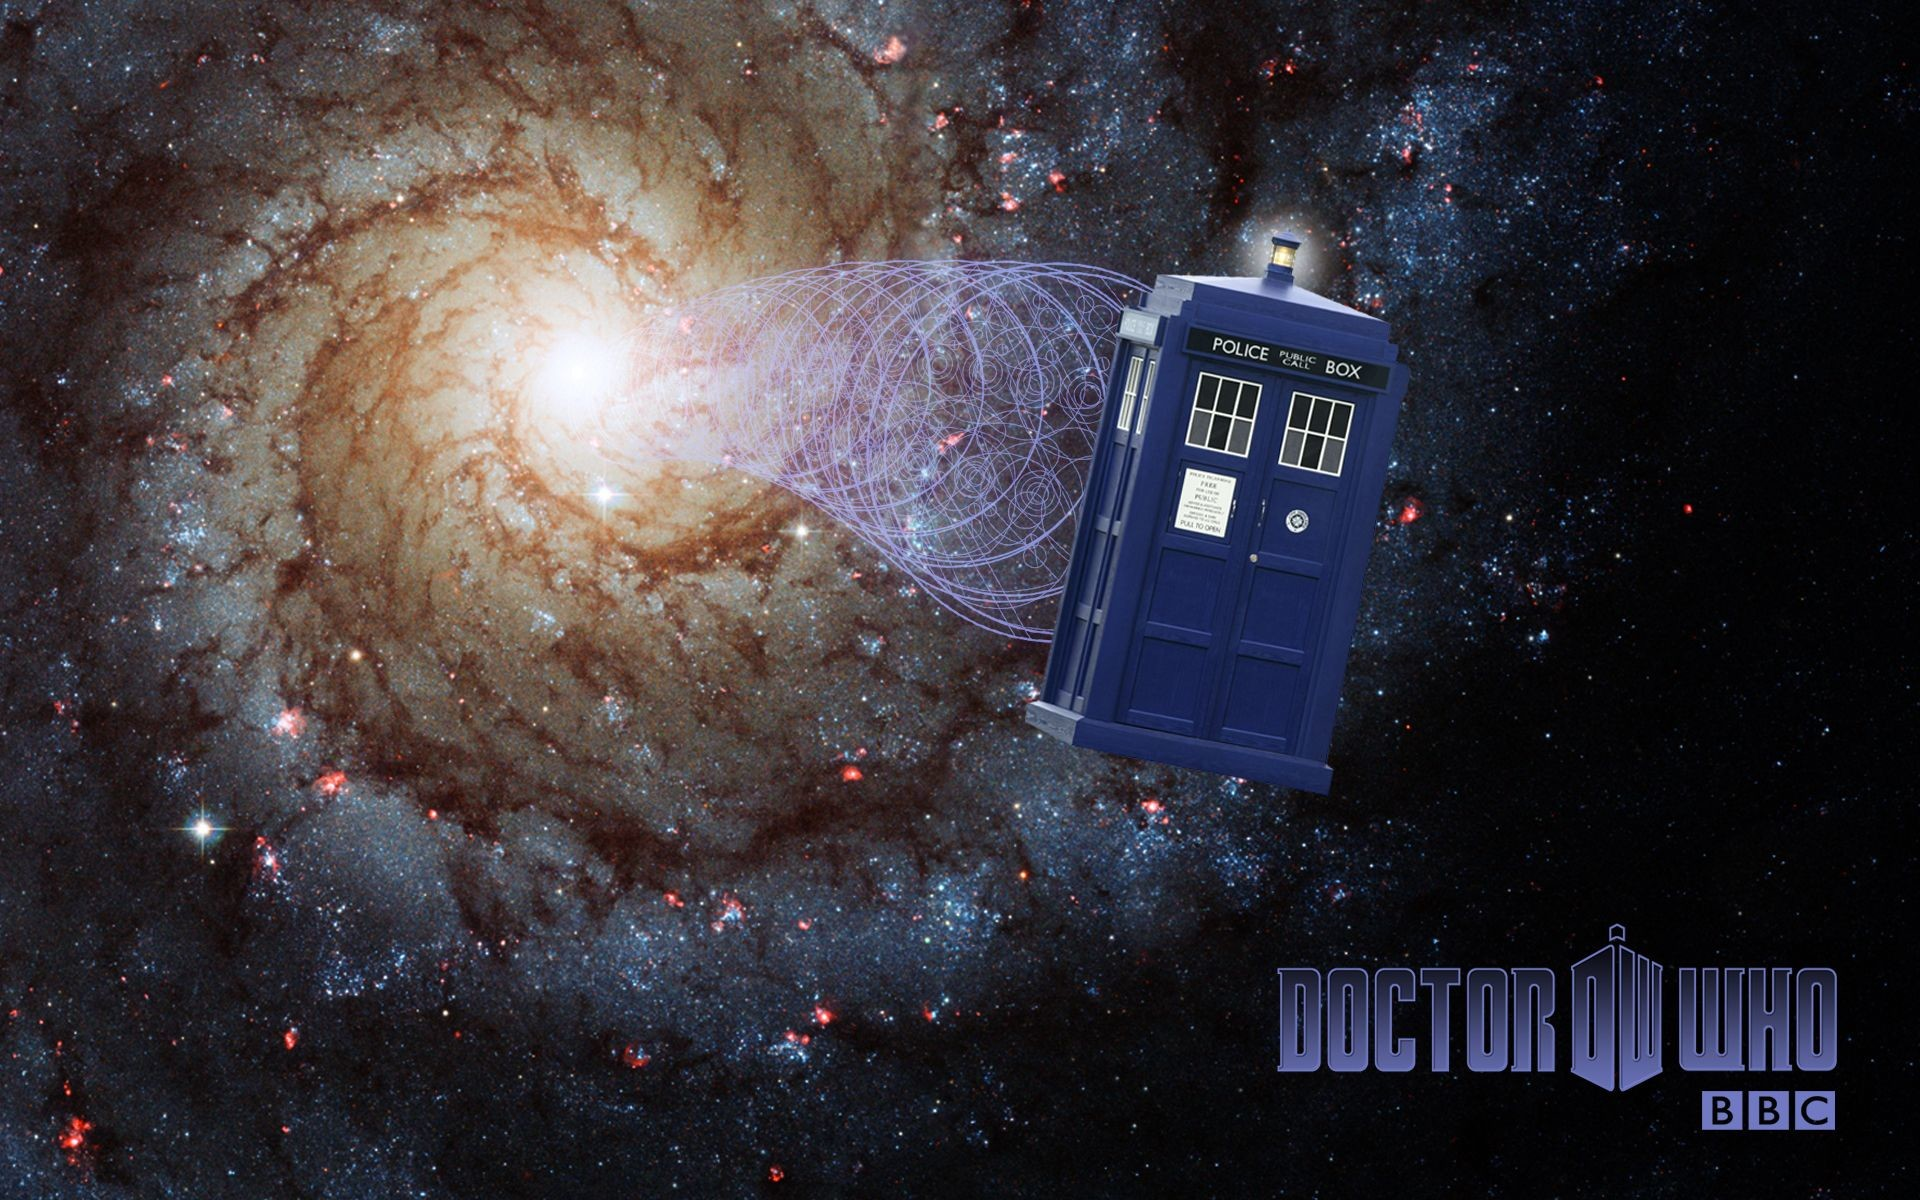 Doctor-Who-Wallpapers-Tardis.jpg